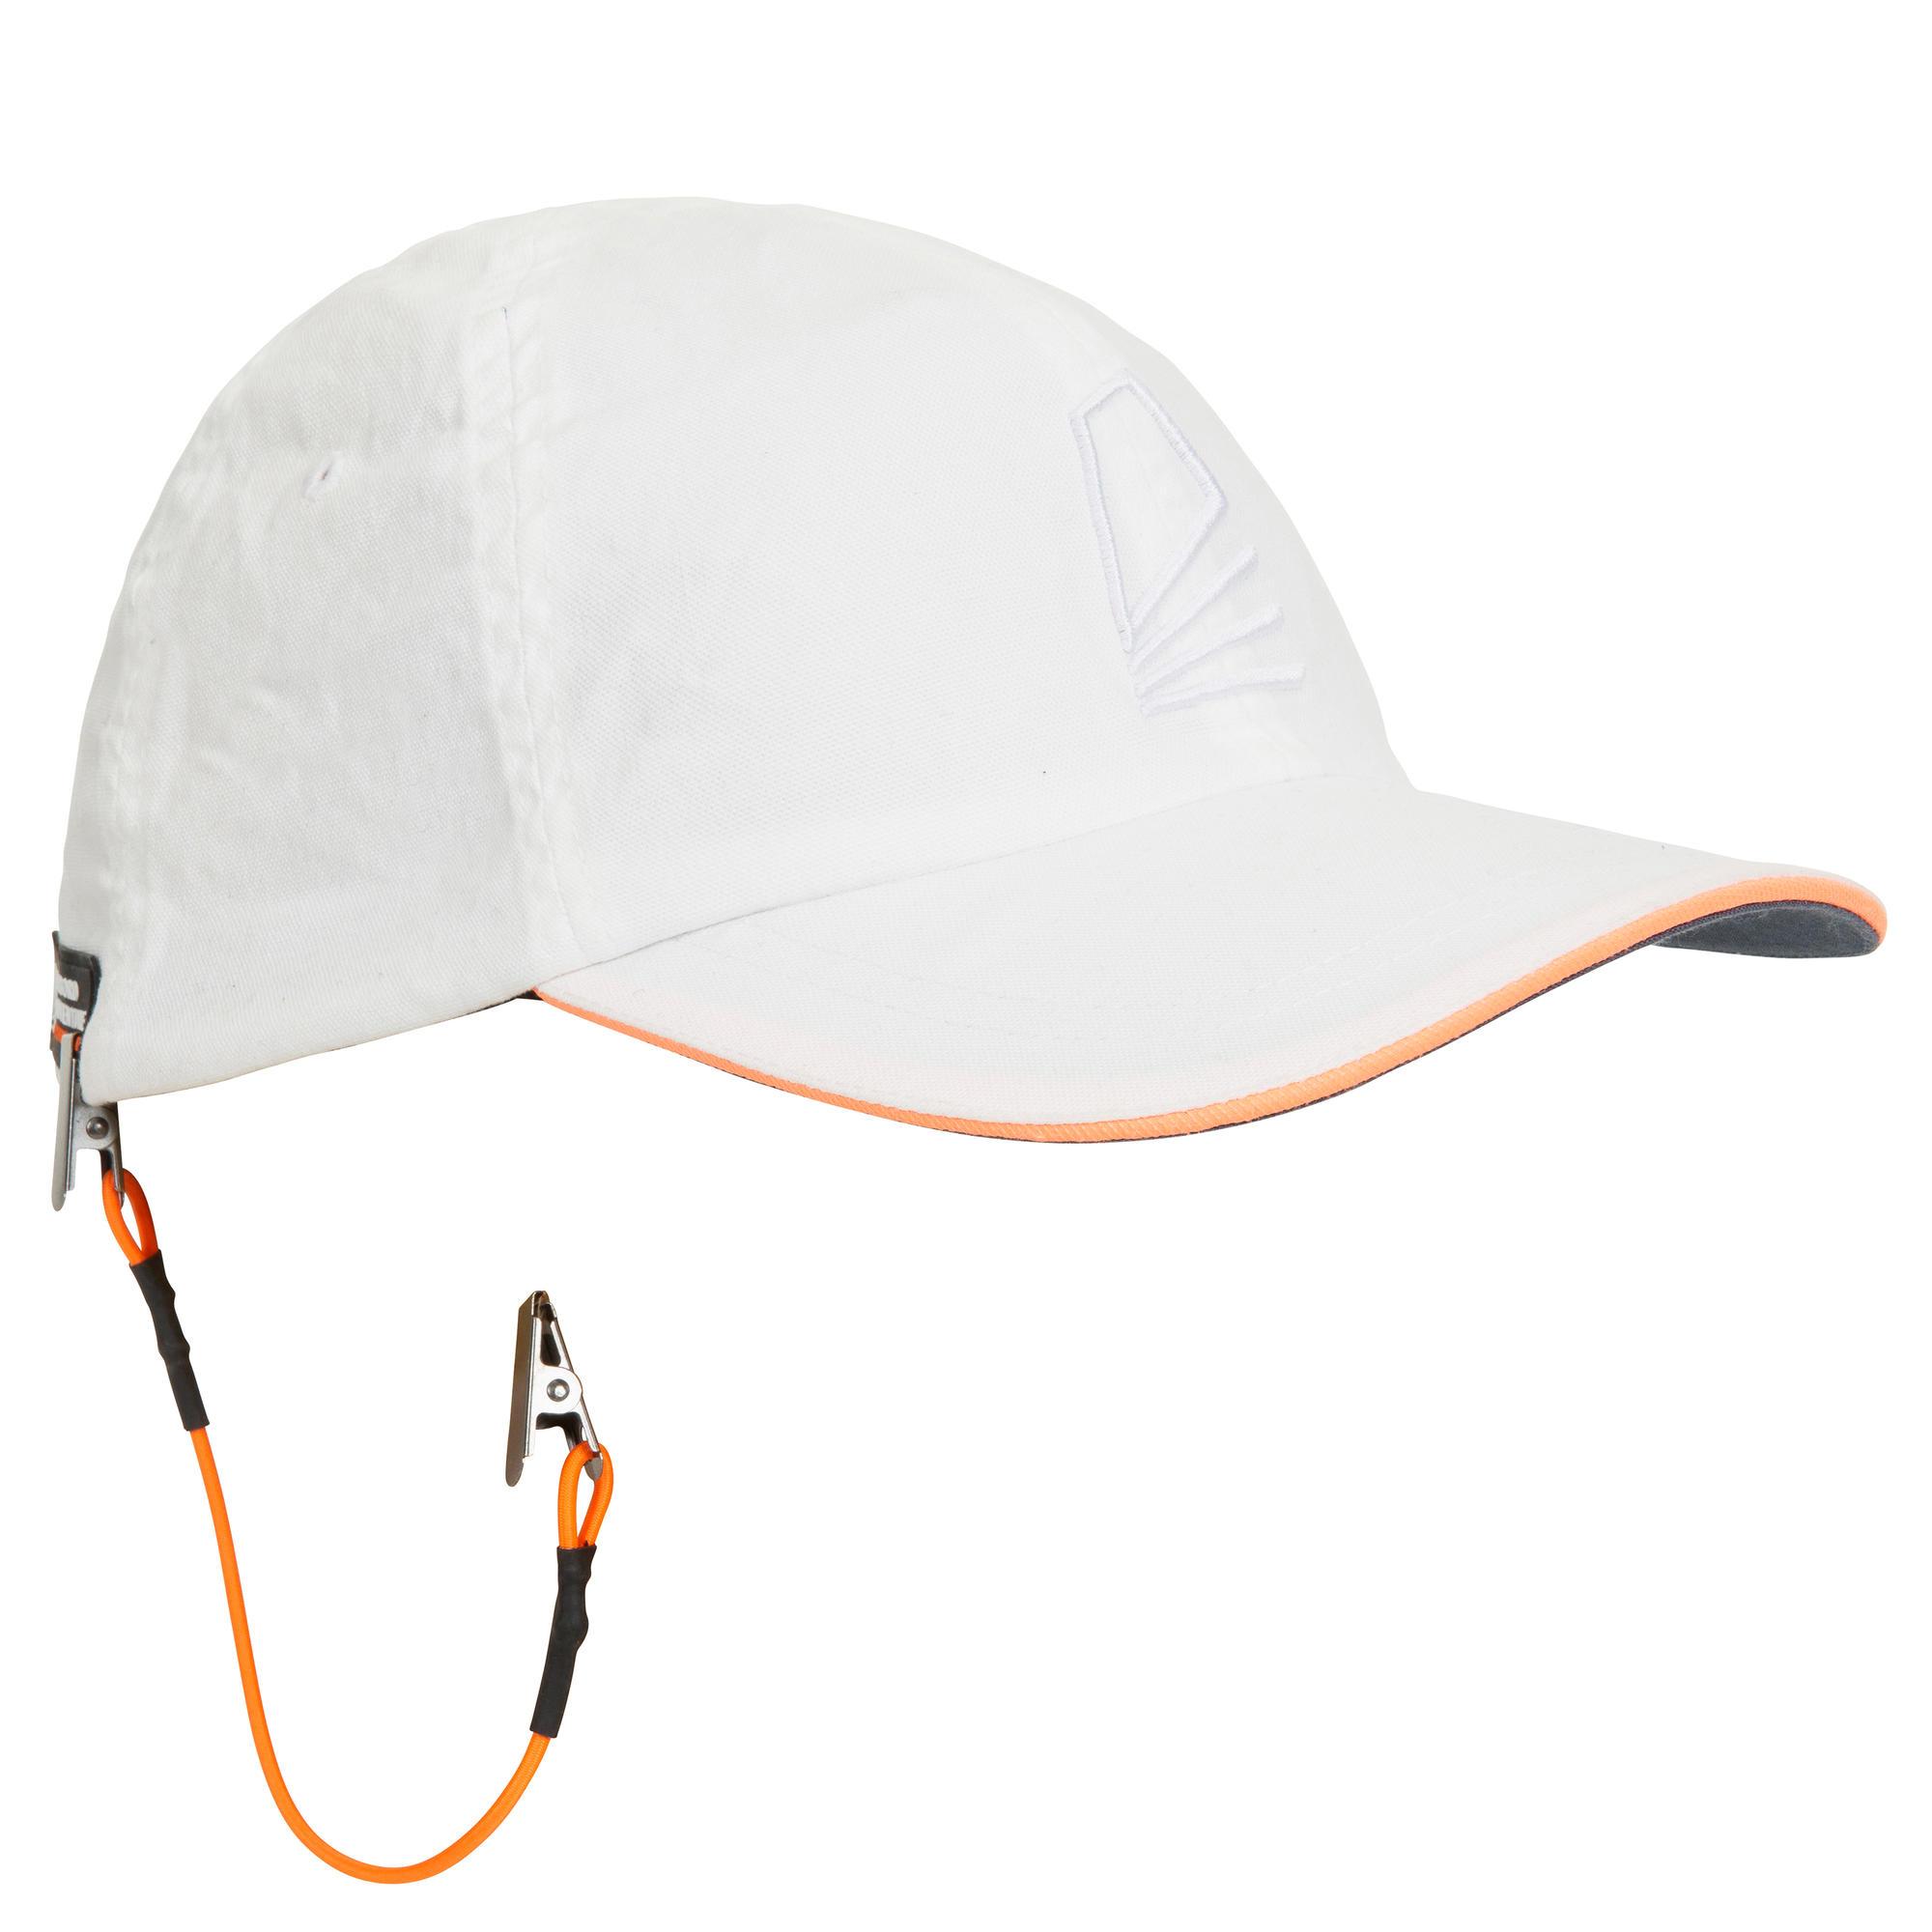 2768096863a Sailing 100 Adult Sailing Cap - White